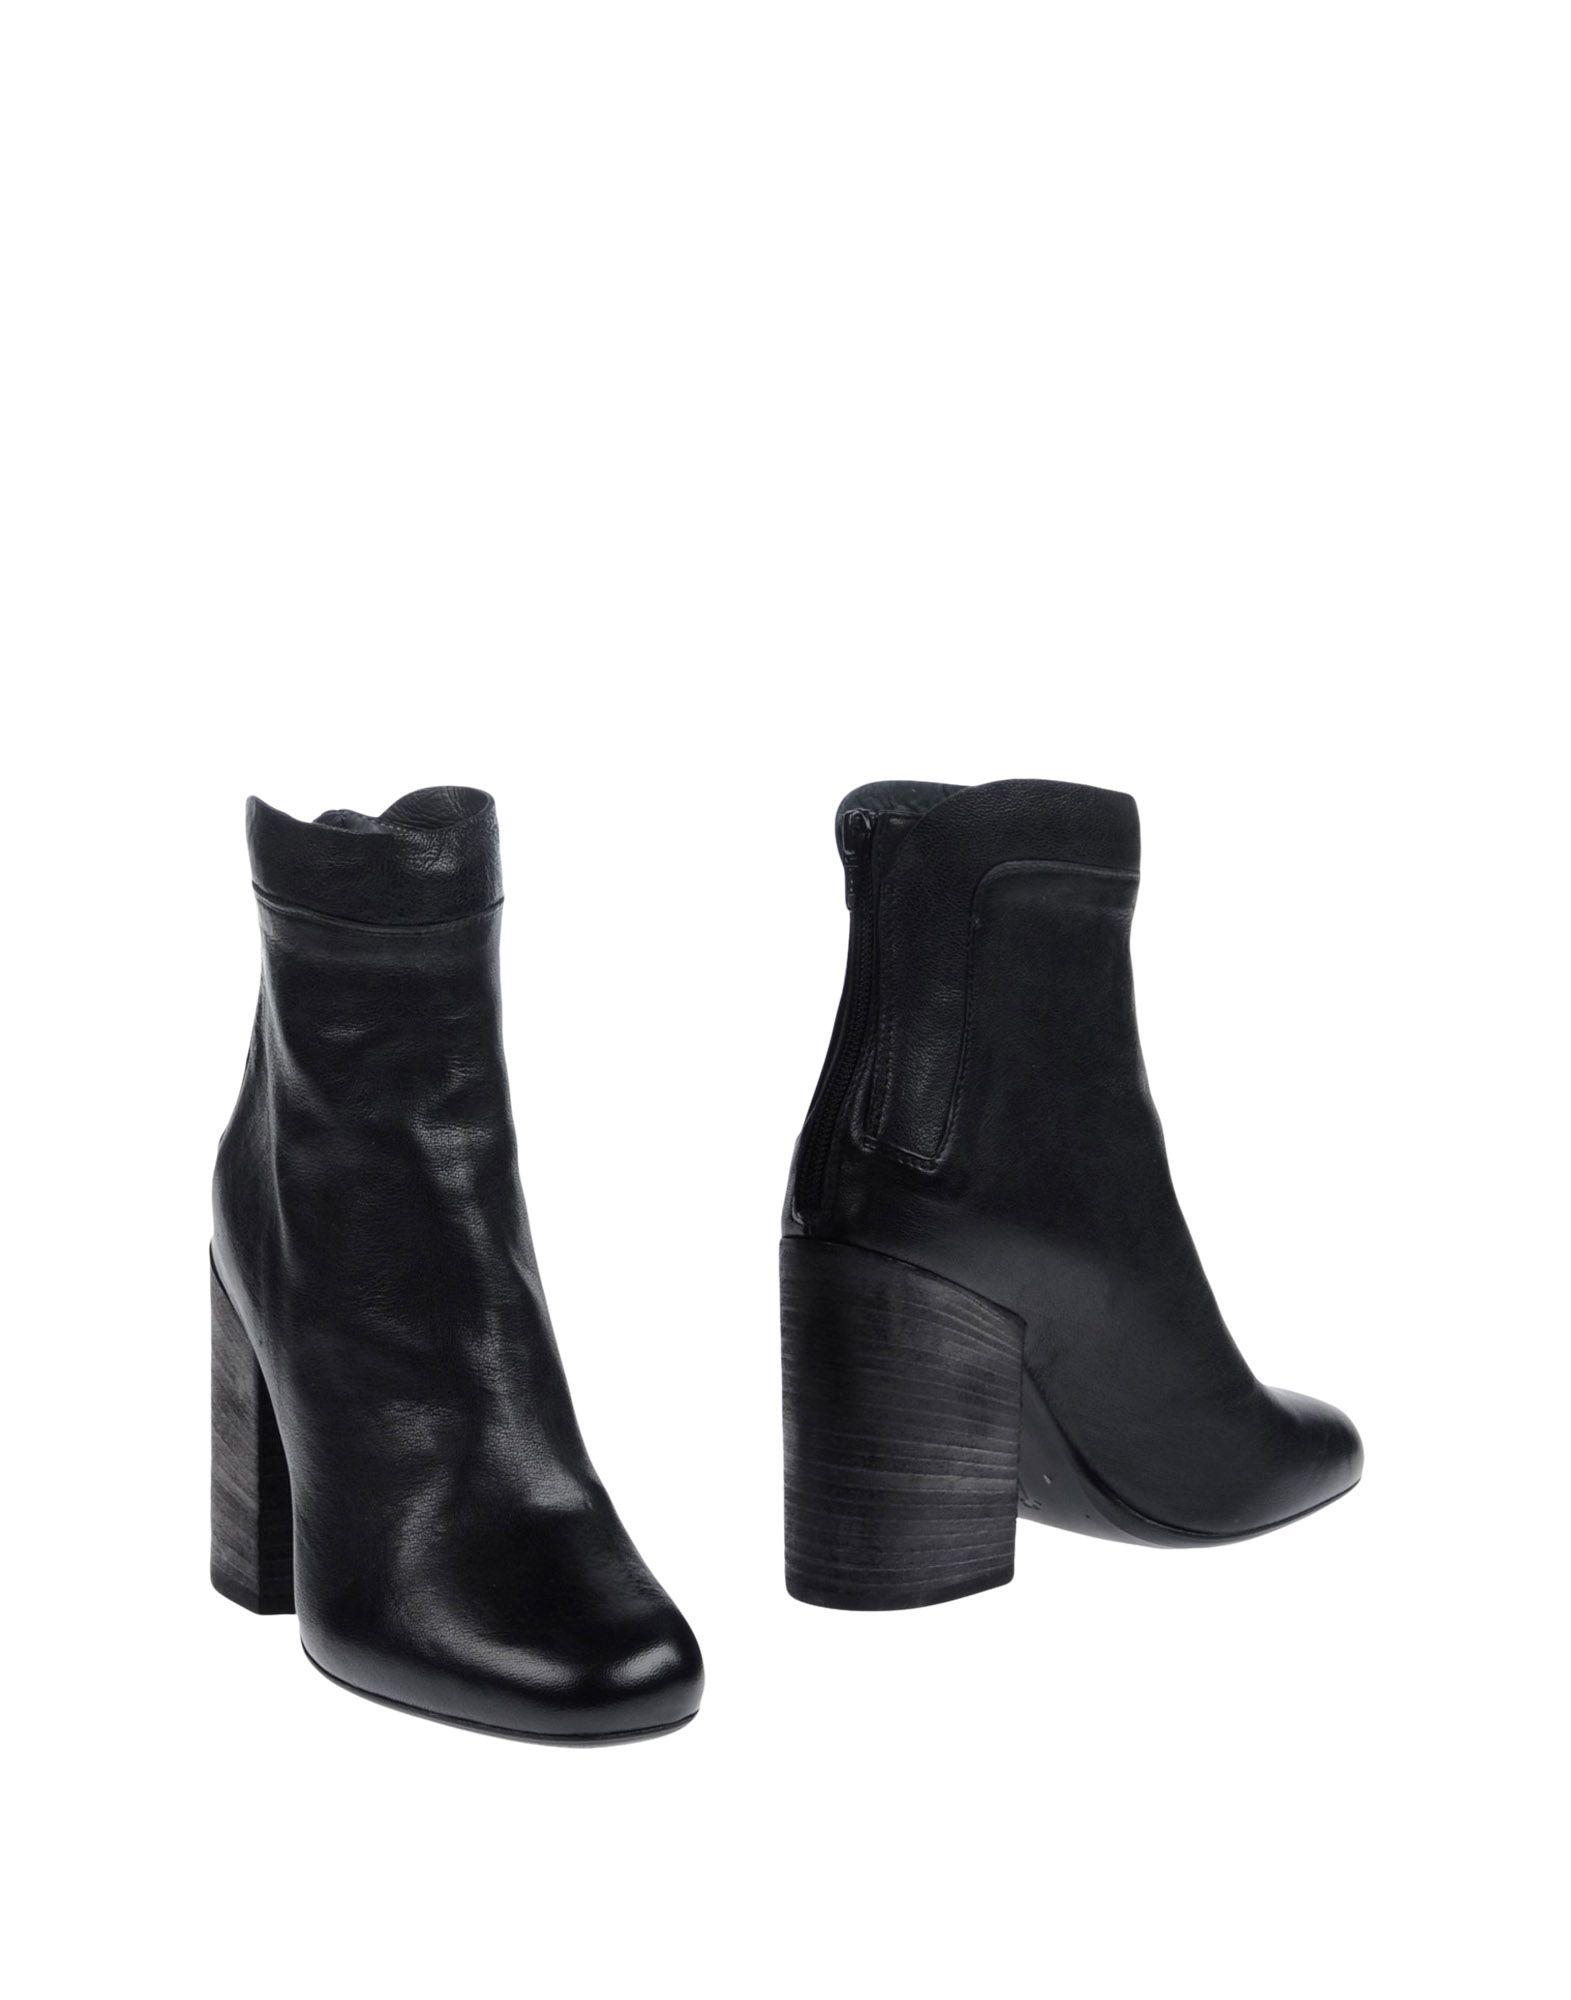 Michelediloco Schuhe Stiefelette Damen  11247309SB Gute Qualität beliebte Schuhe Michelediloco fffb22